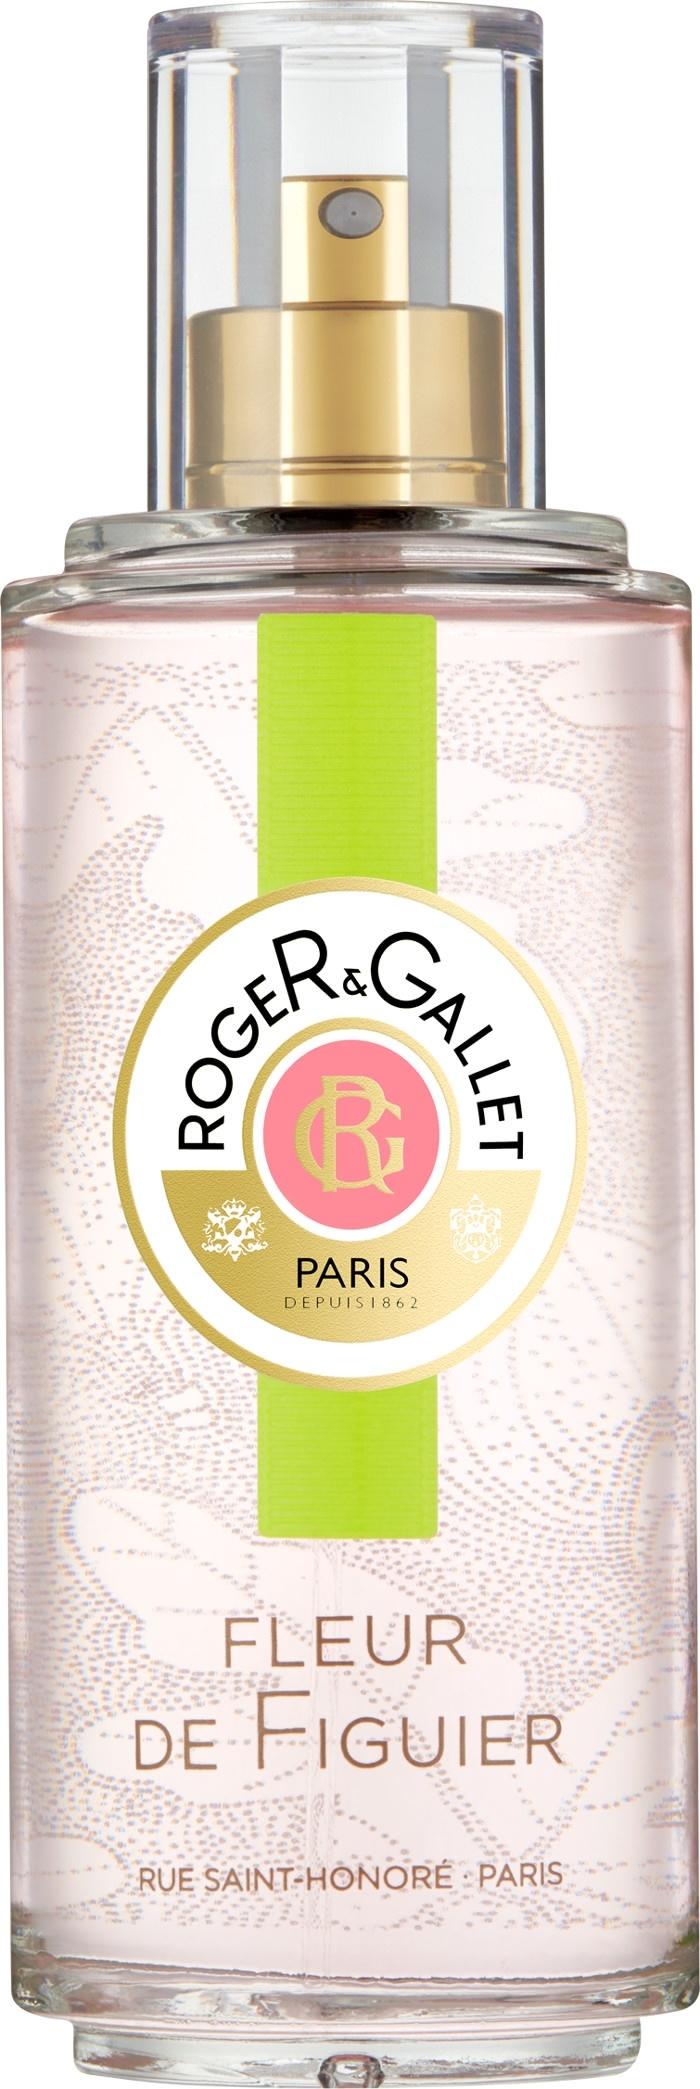 Roger & Gallet Fleur De Figuier Fragrant Water Spray 100ml